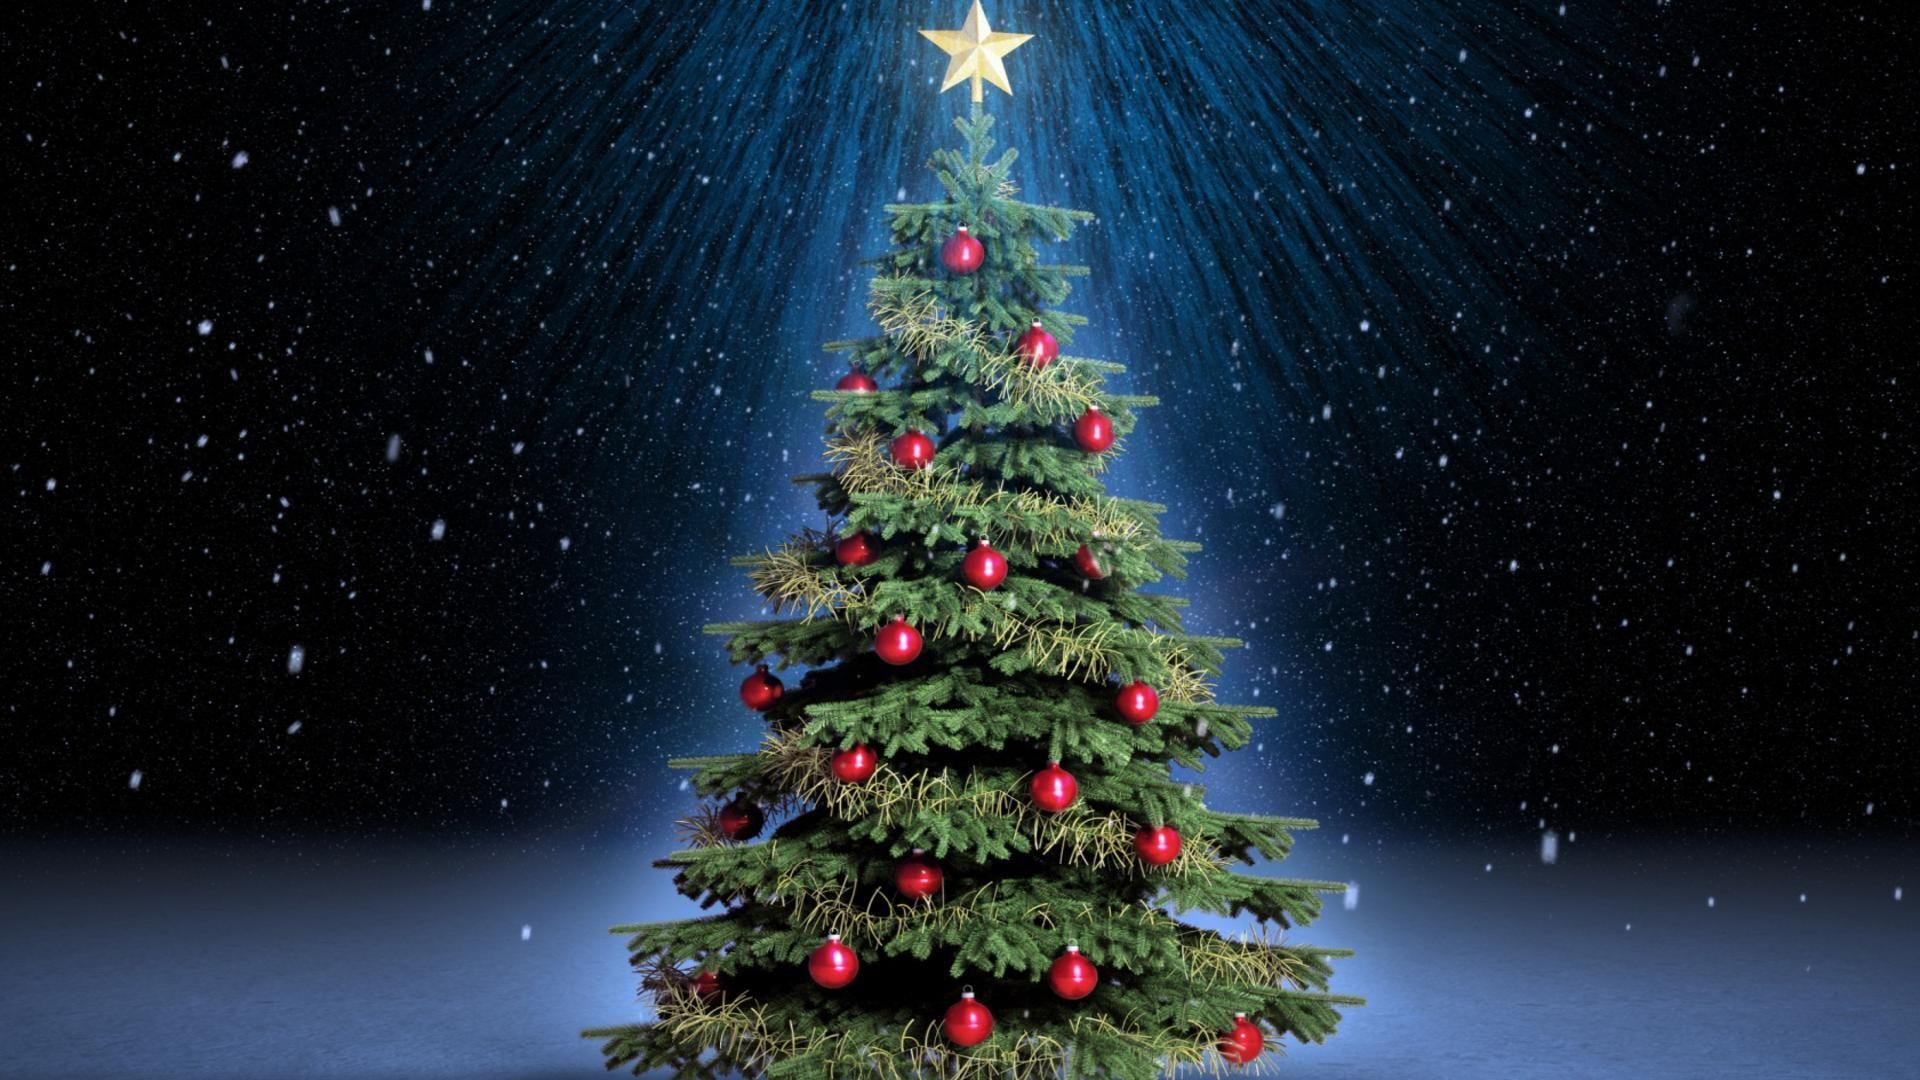 Christmas Tree wallpaper download